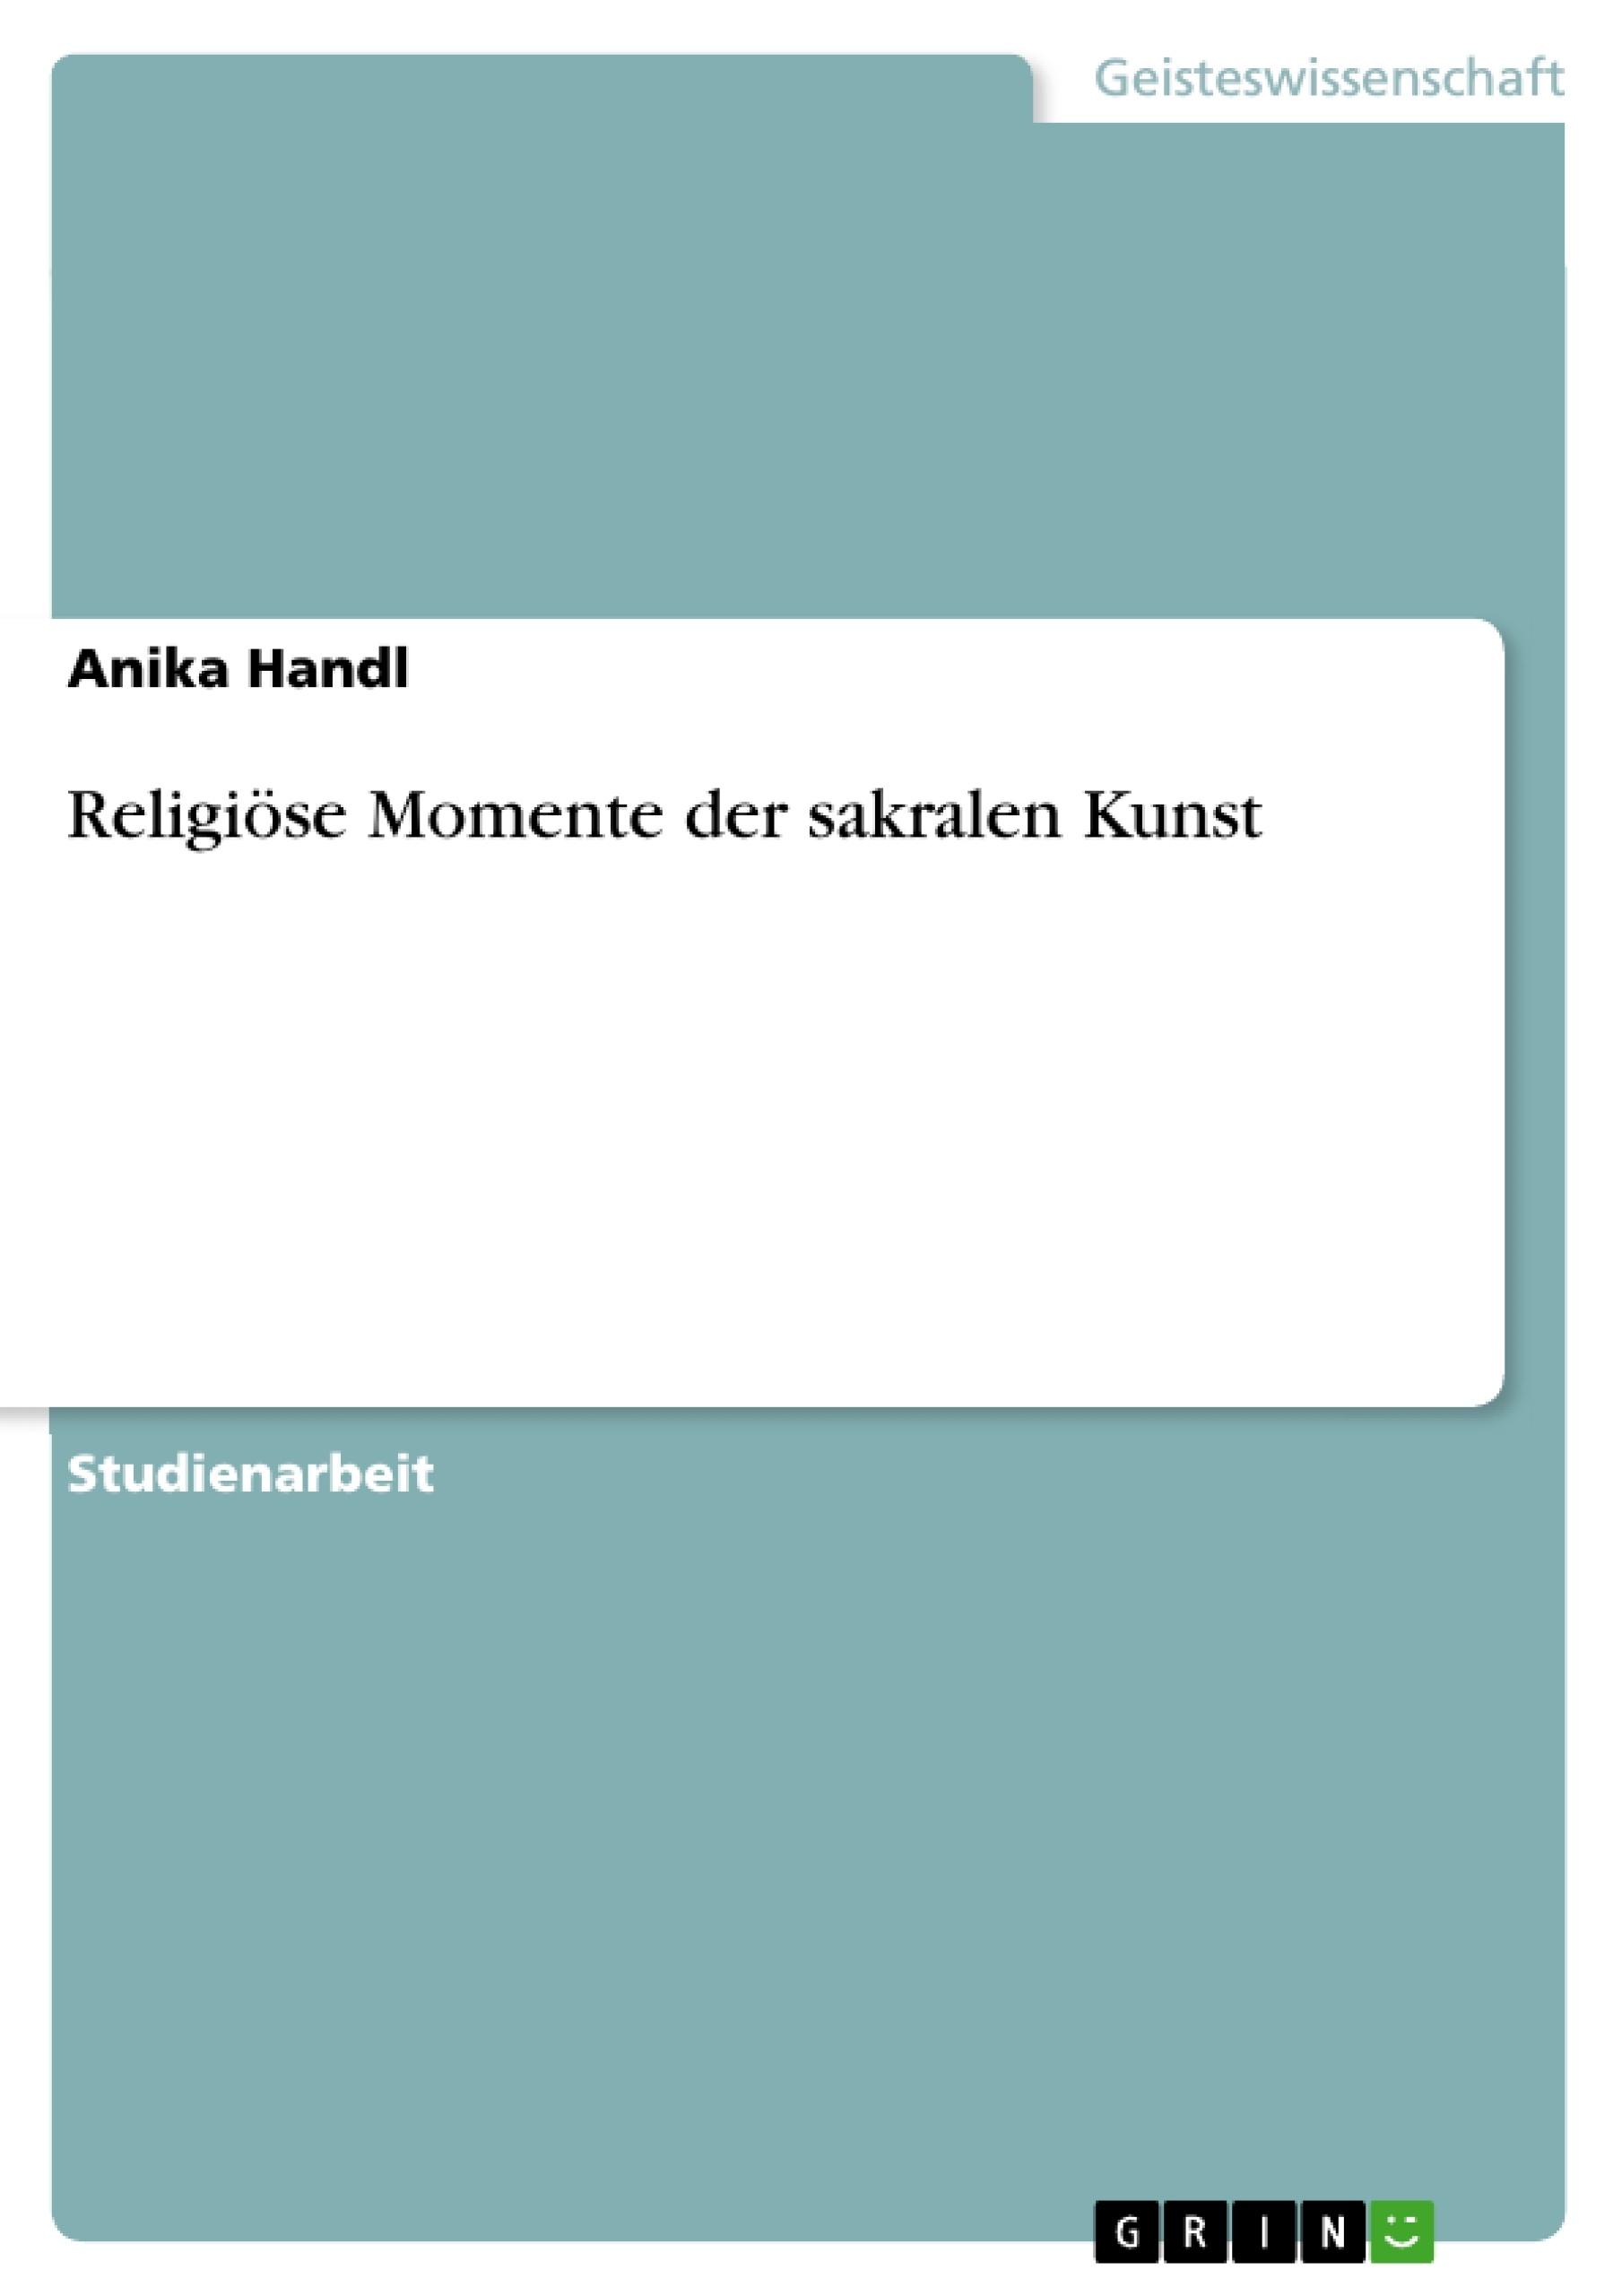 Titel: Religiöse Momente der sakralen Kunst